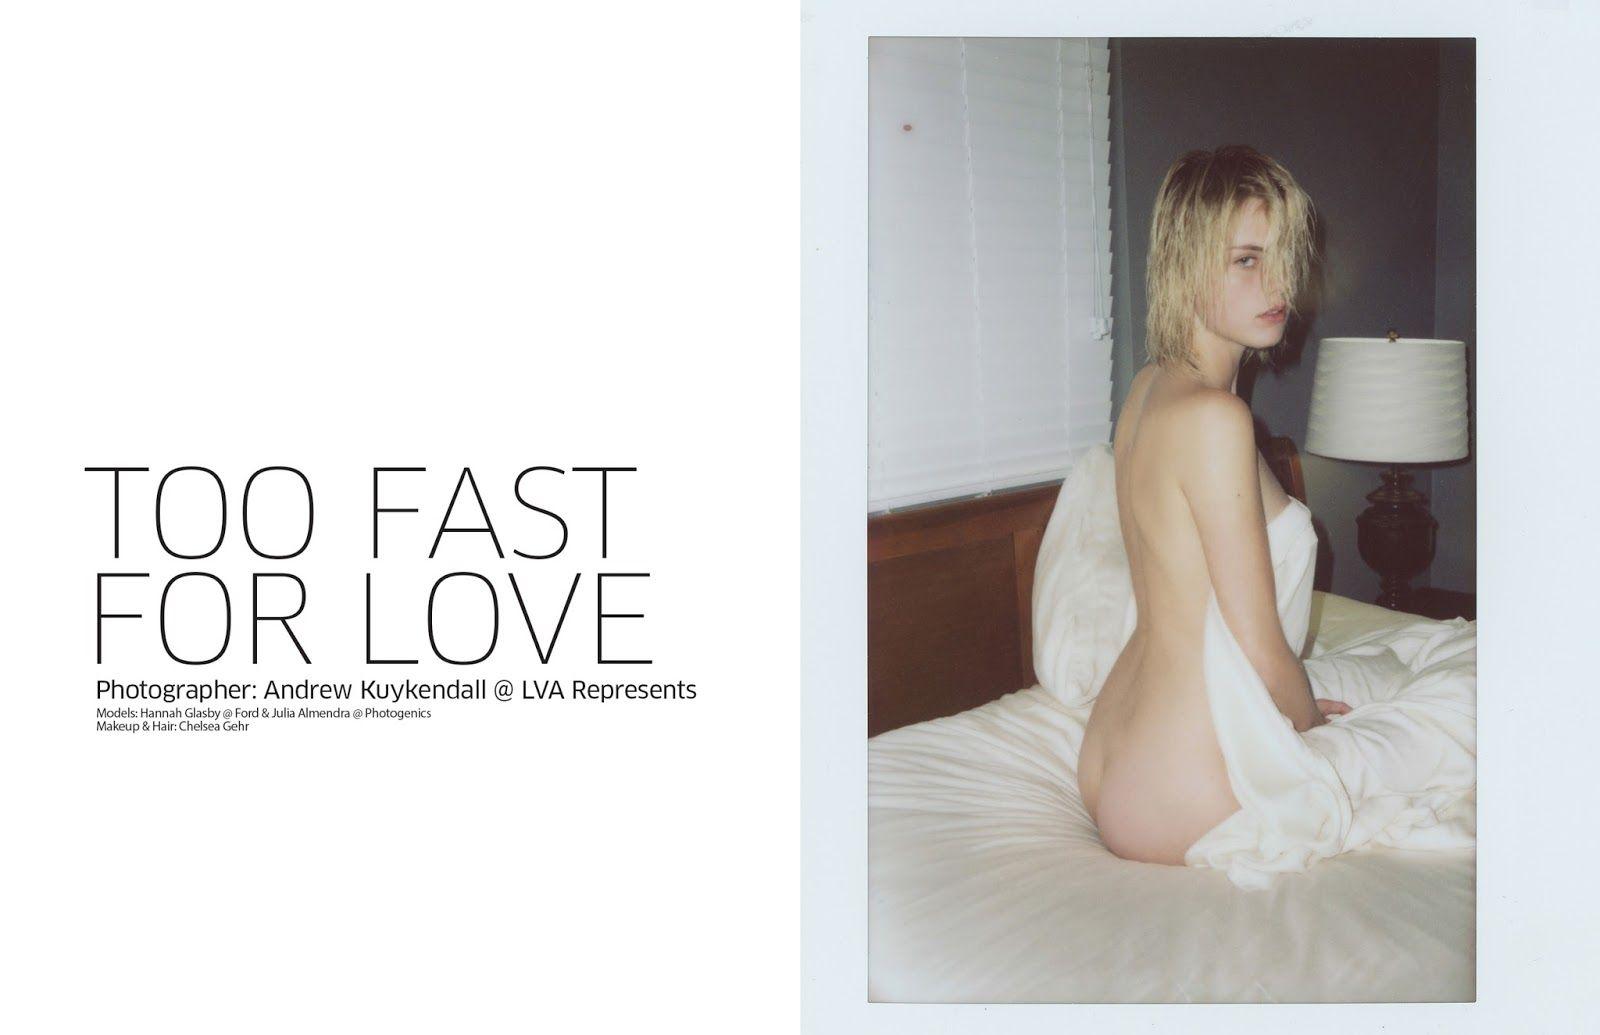 Hannah Glasby & Julia Almendra Topless (7 Photos)